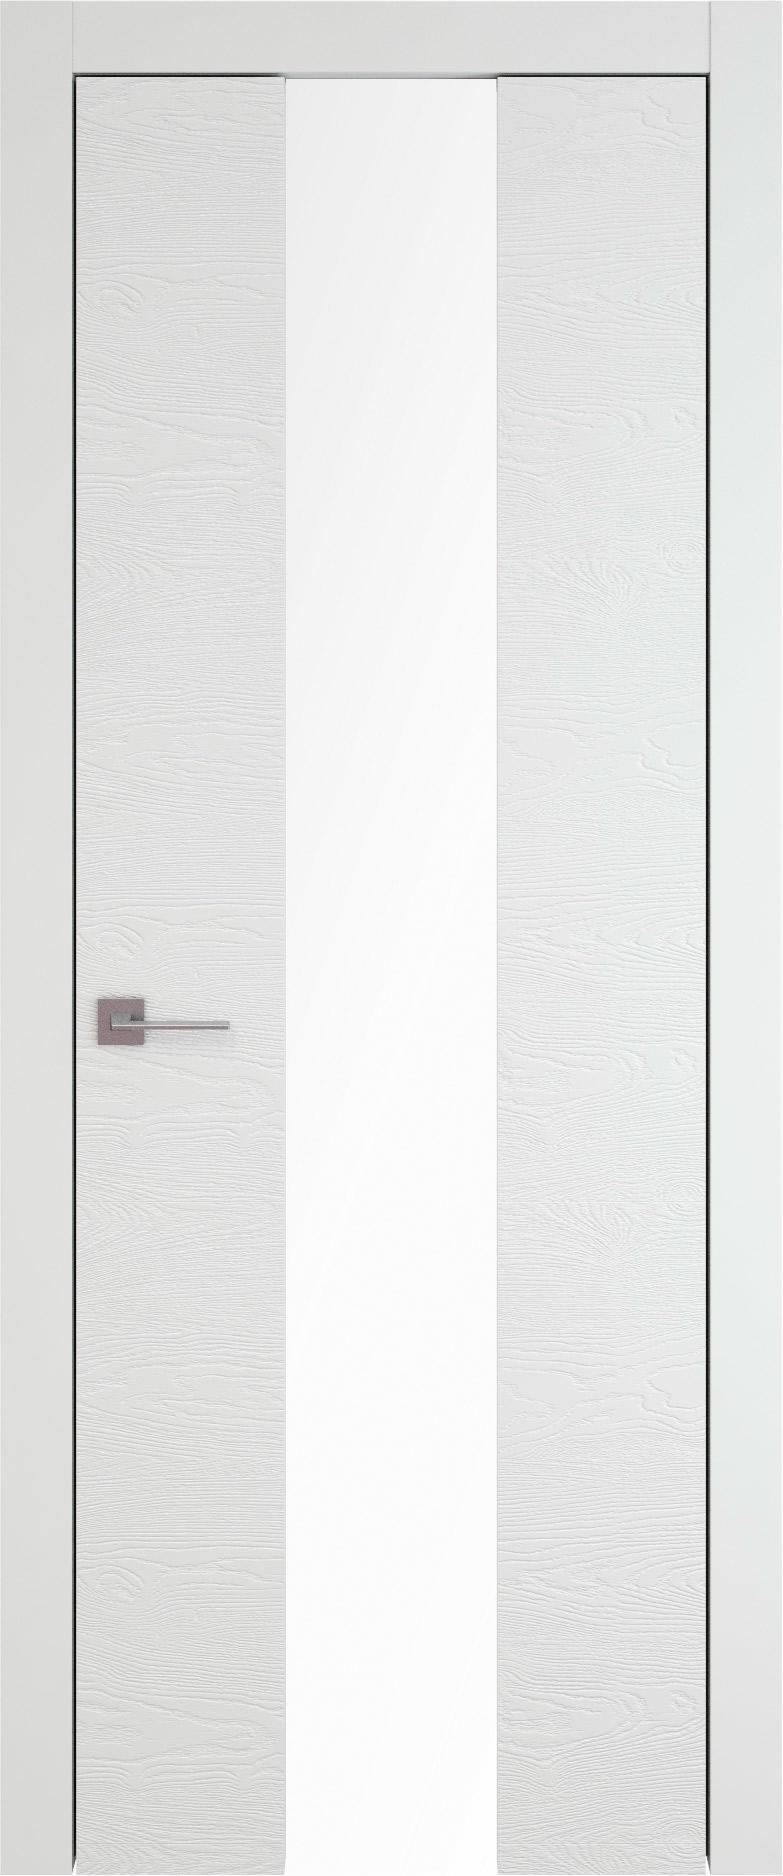 Tivoli Ж-5 цвет - Белая эмаль по шпону (RAL 9003) Со стеклом (ДО)